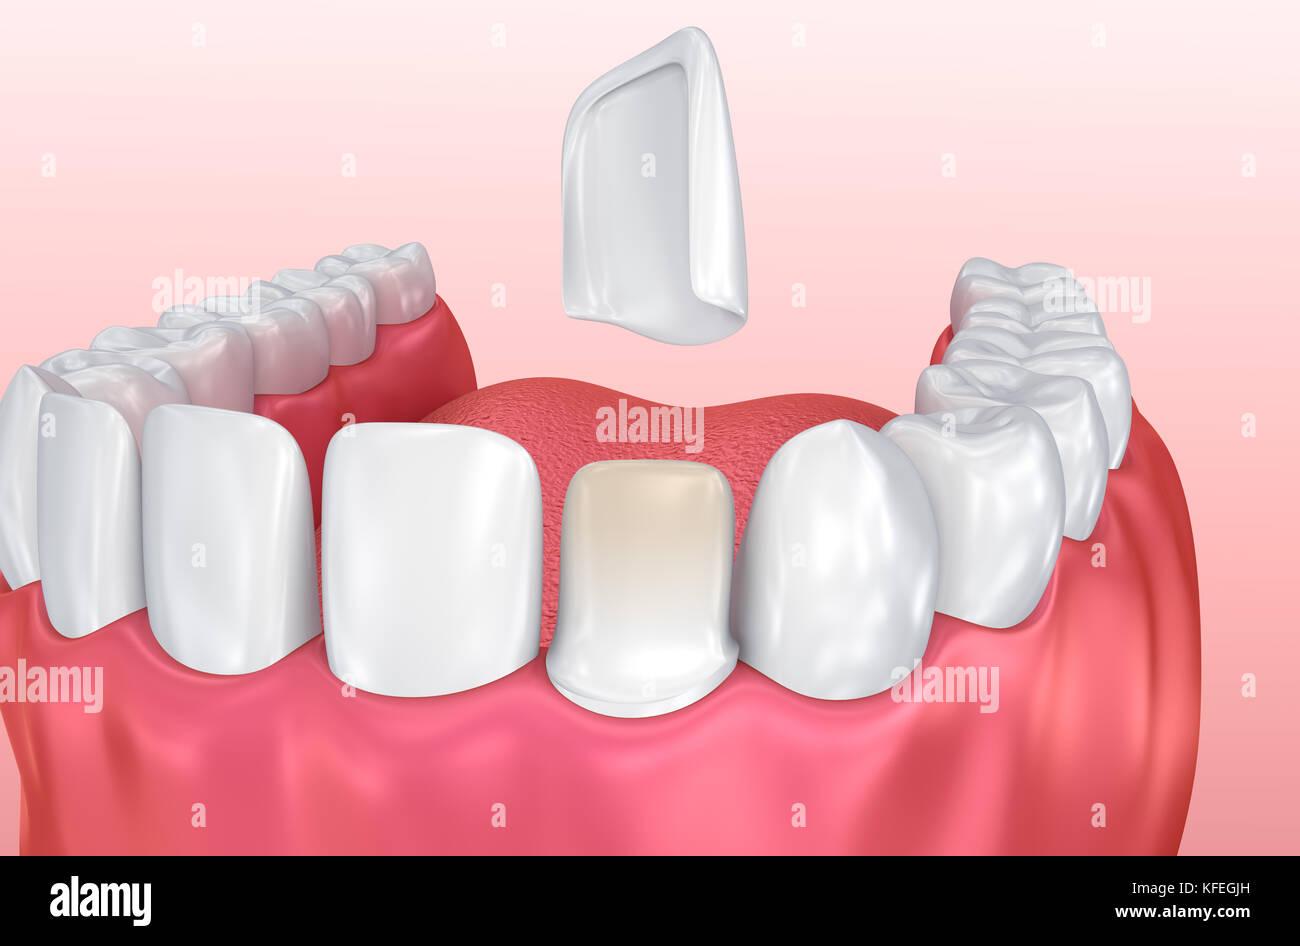 Dental Veneers: Porcelain Veneer installation Procedure. 3D illustration - Stock Image